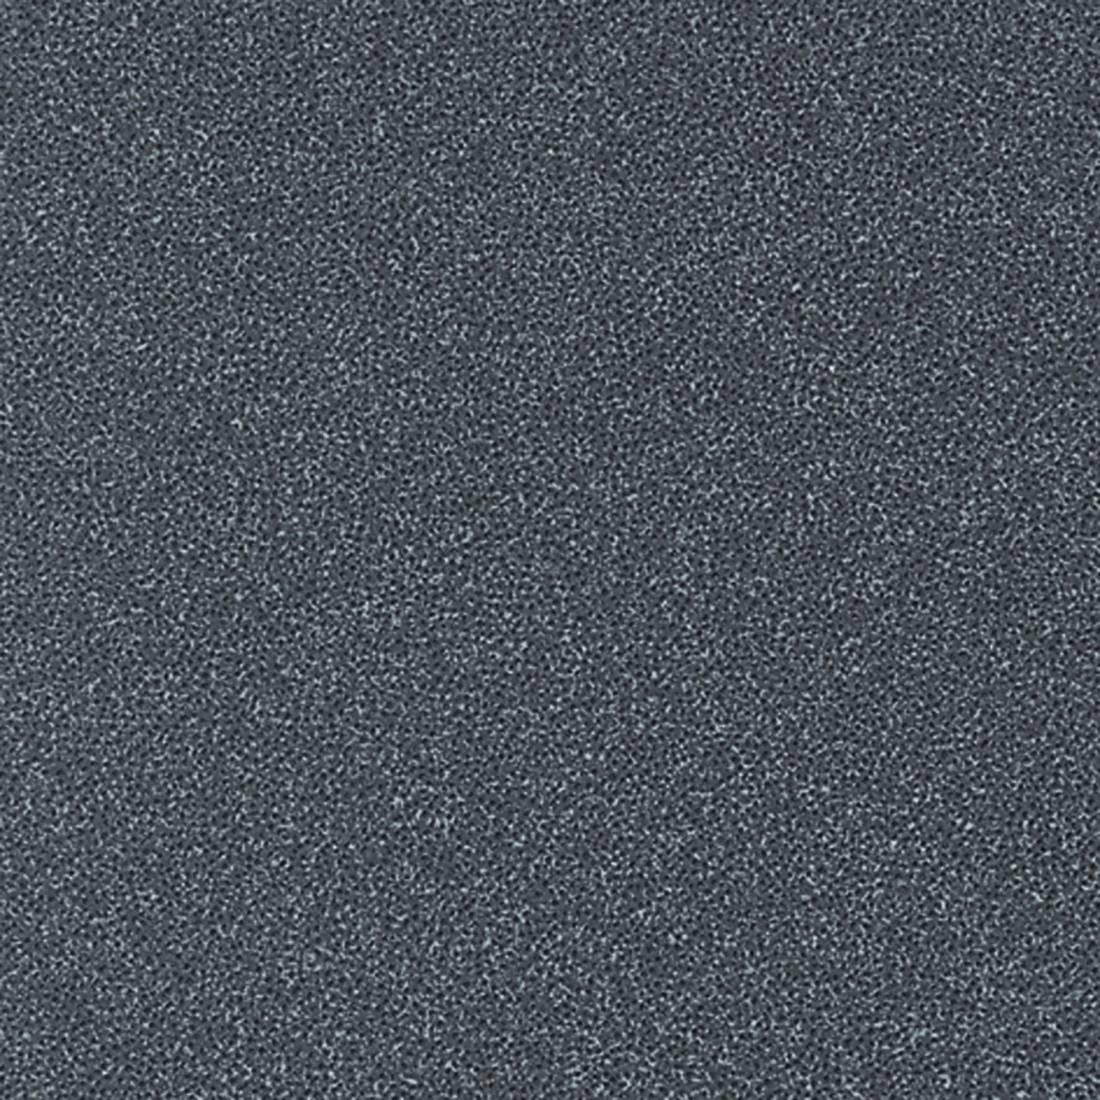 Granit 30x30 Rio Negro Black Matt R12 1